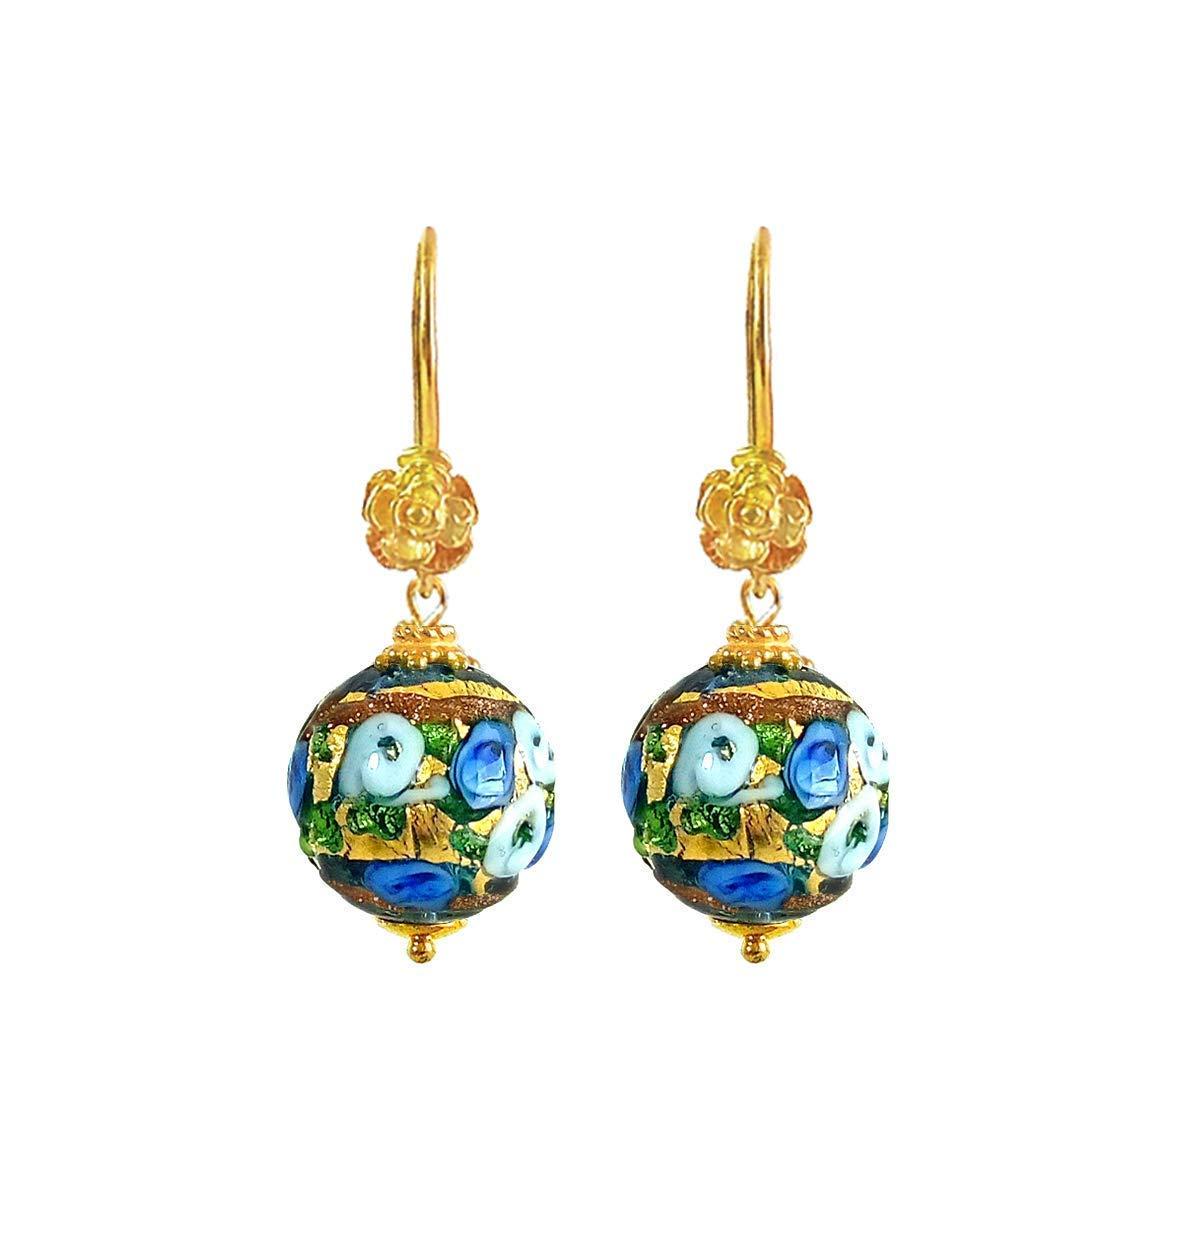 14K Rolled Rose Gold /& Vermeil Earrings Art Deco MURANO Blue /& Aventurine Glass